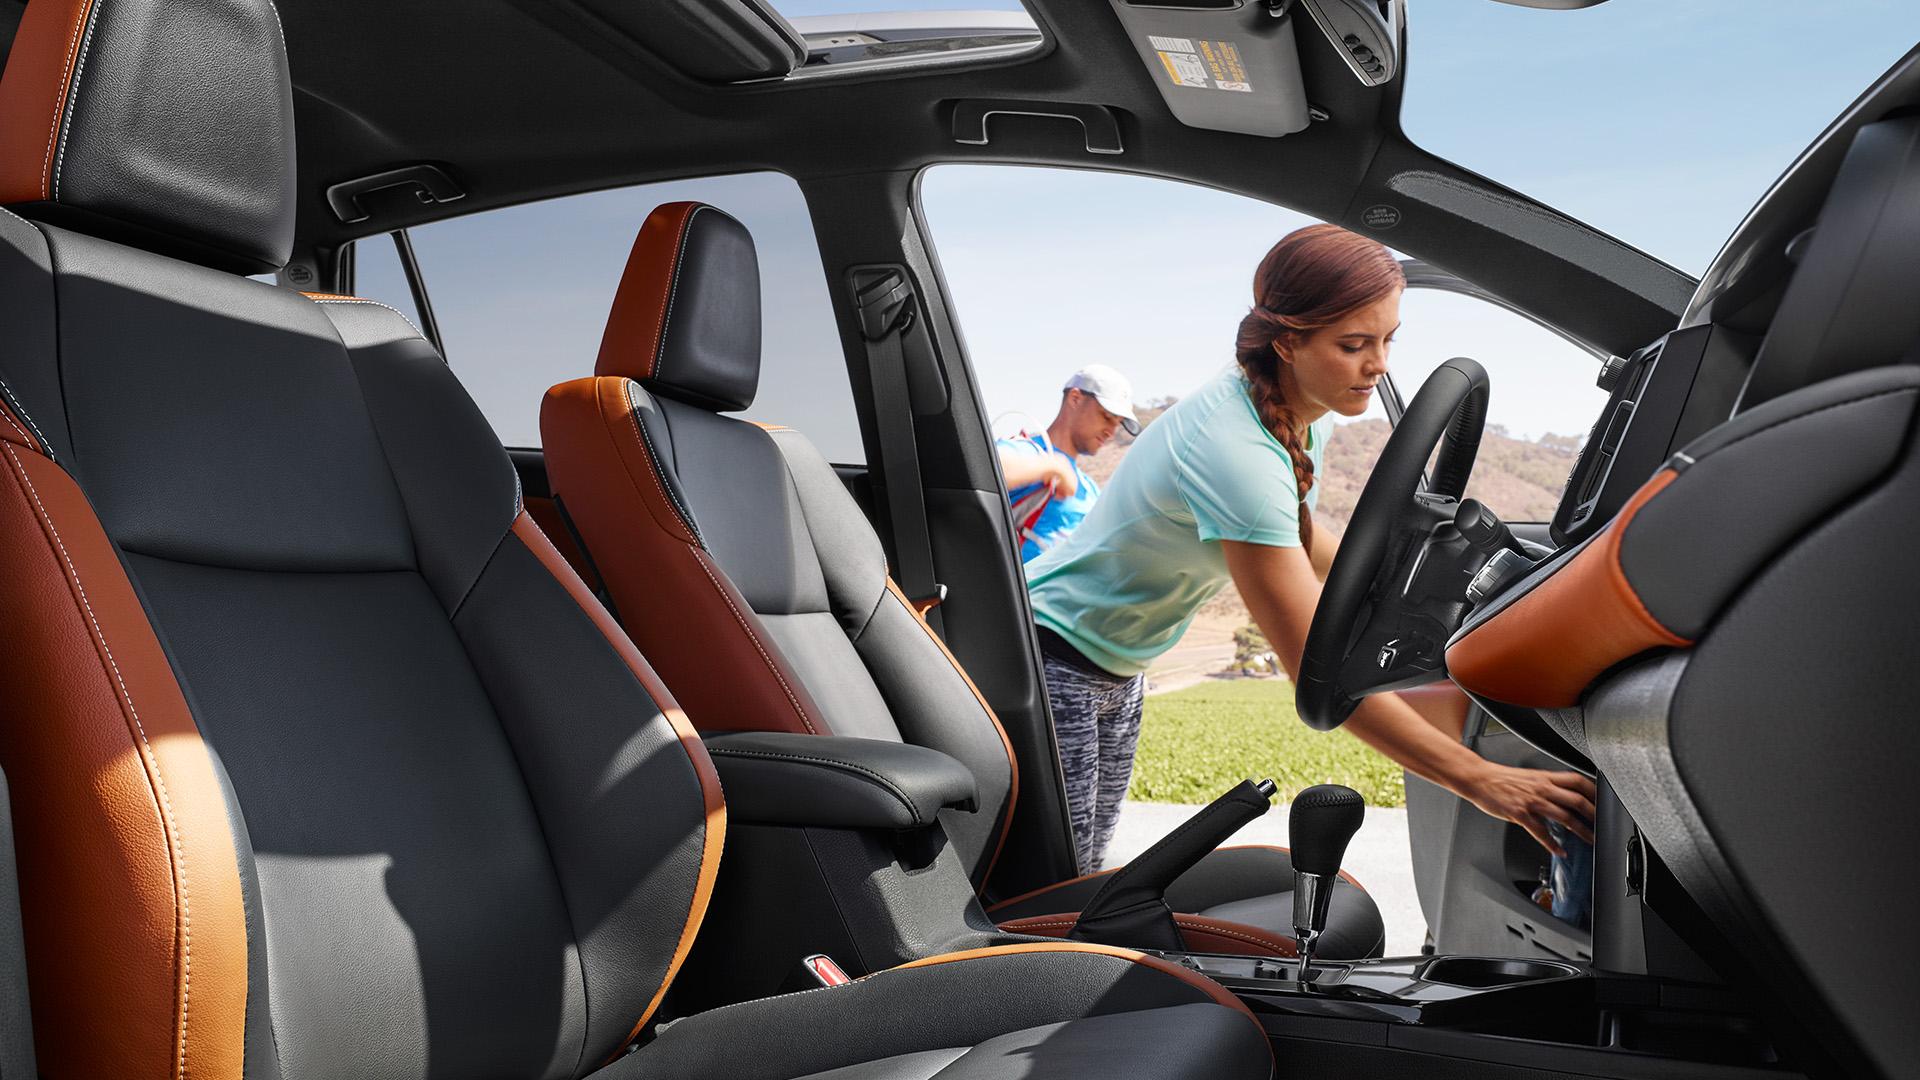 2017 Toyota RAV4 vs 2017 Nissan Rogue in Elkhart, IN - Heart